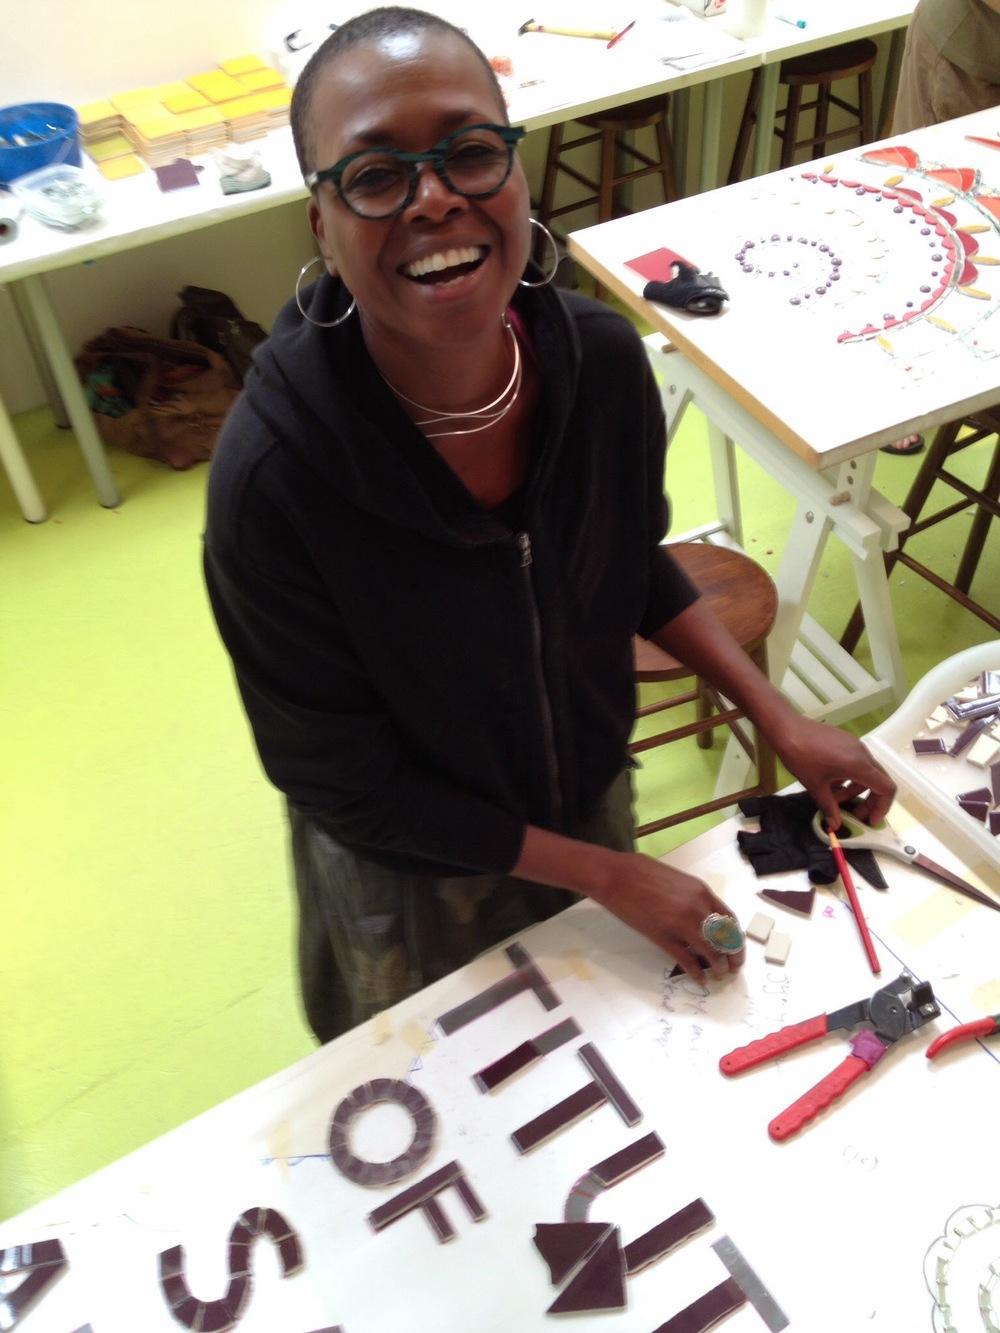 Shelita Birchett Benash Laurel True Mosaic Mural Intensive Institute of Mosaic Art